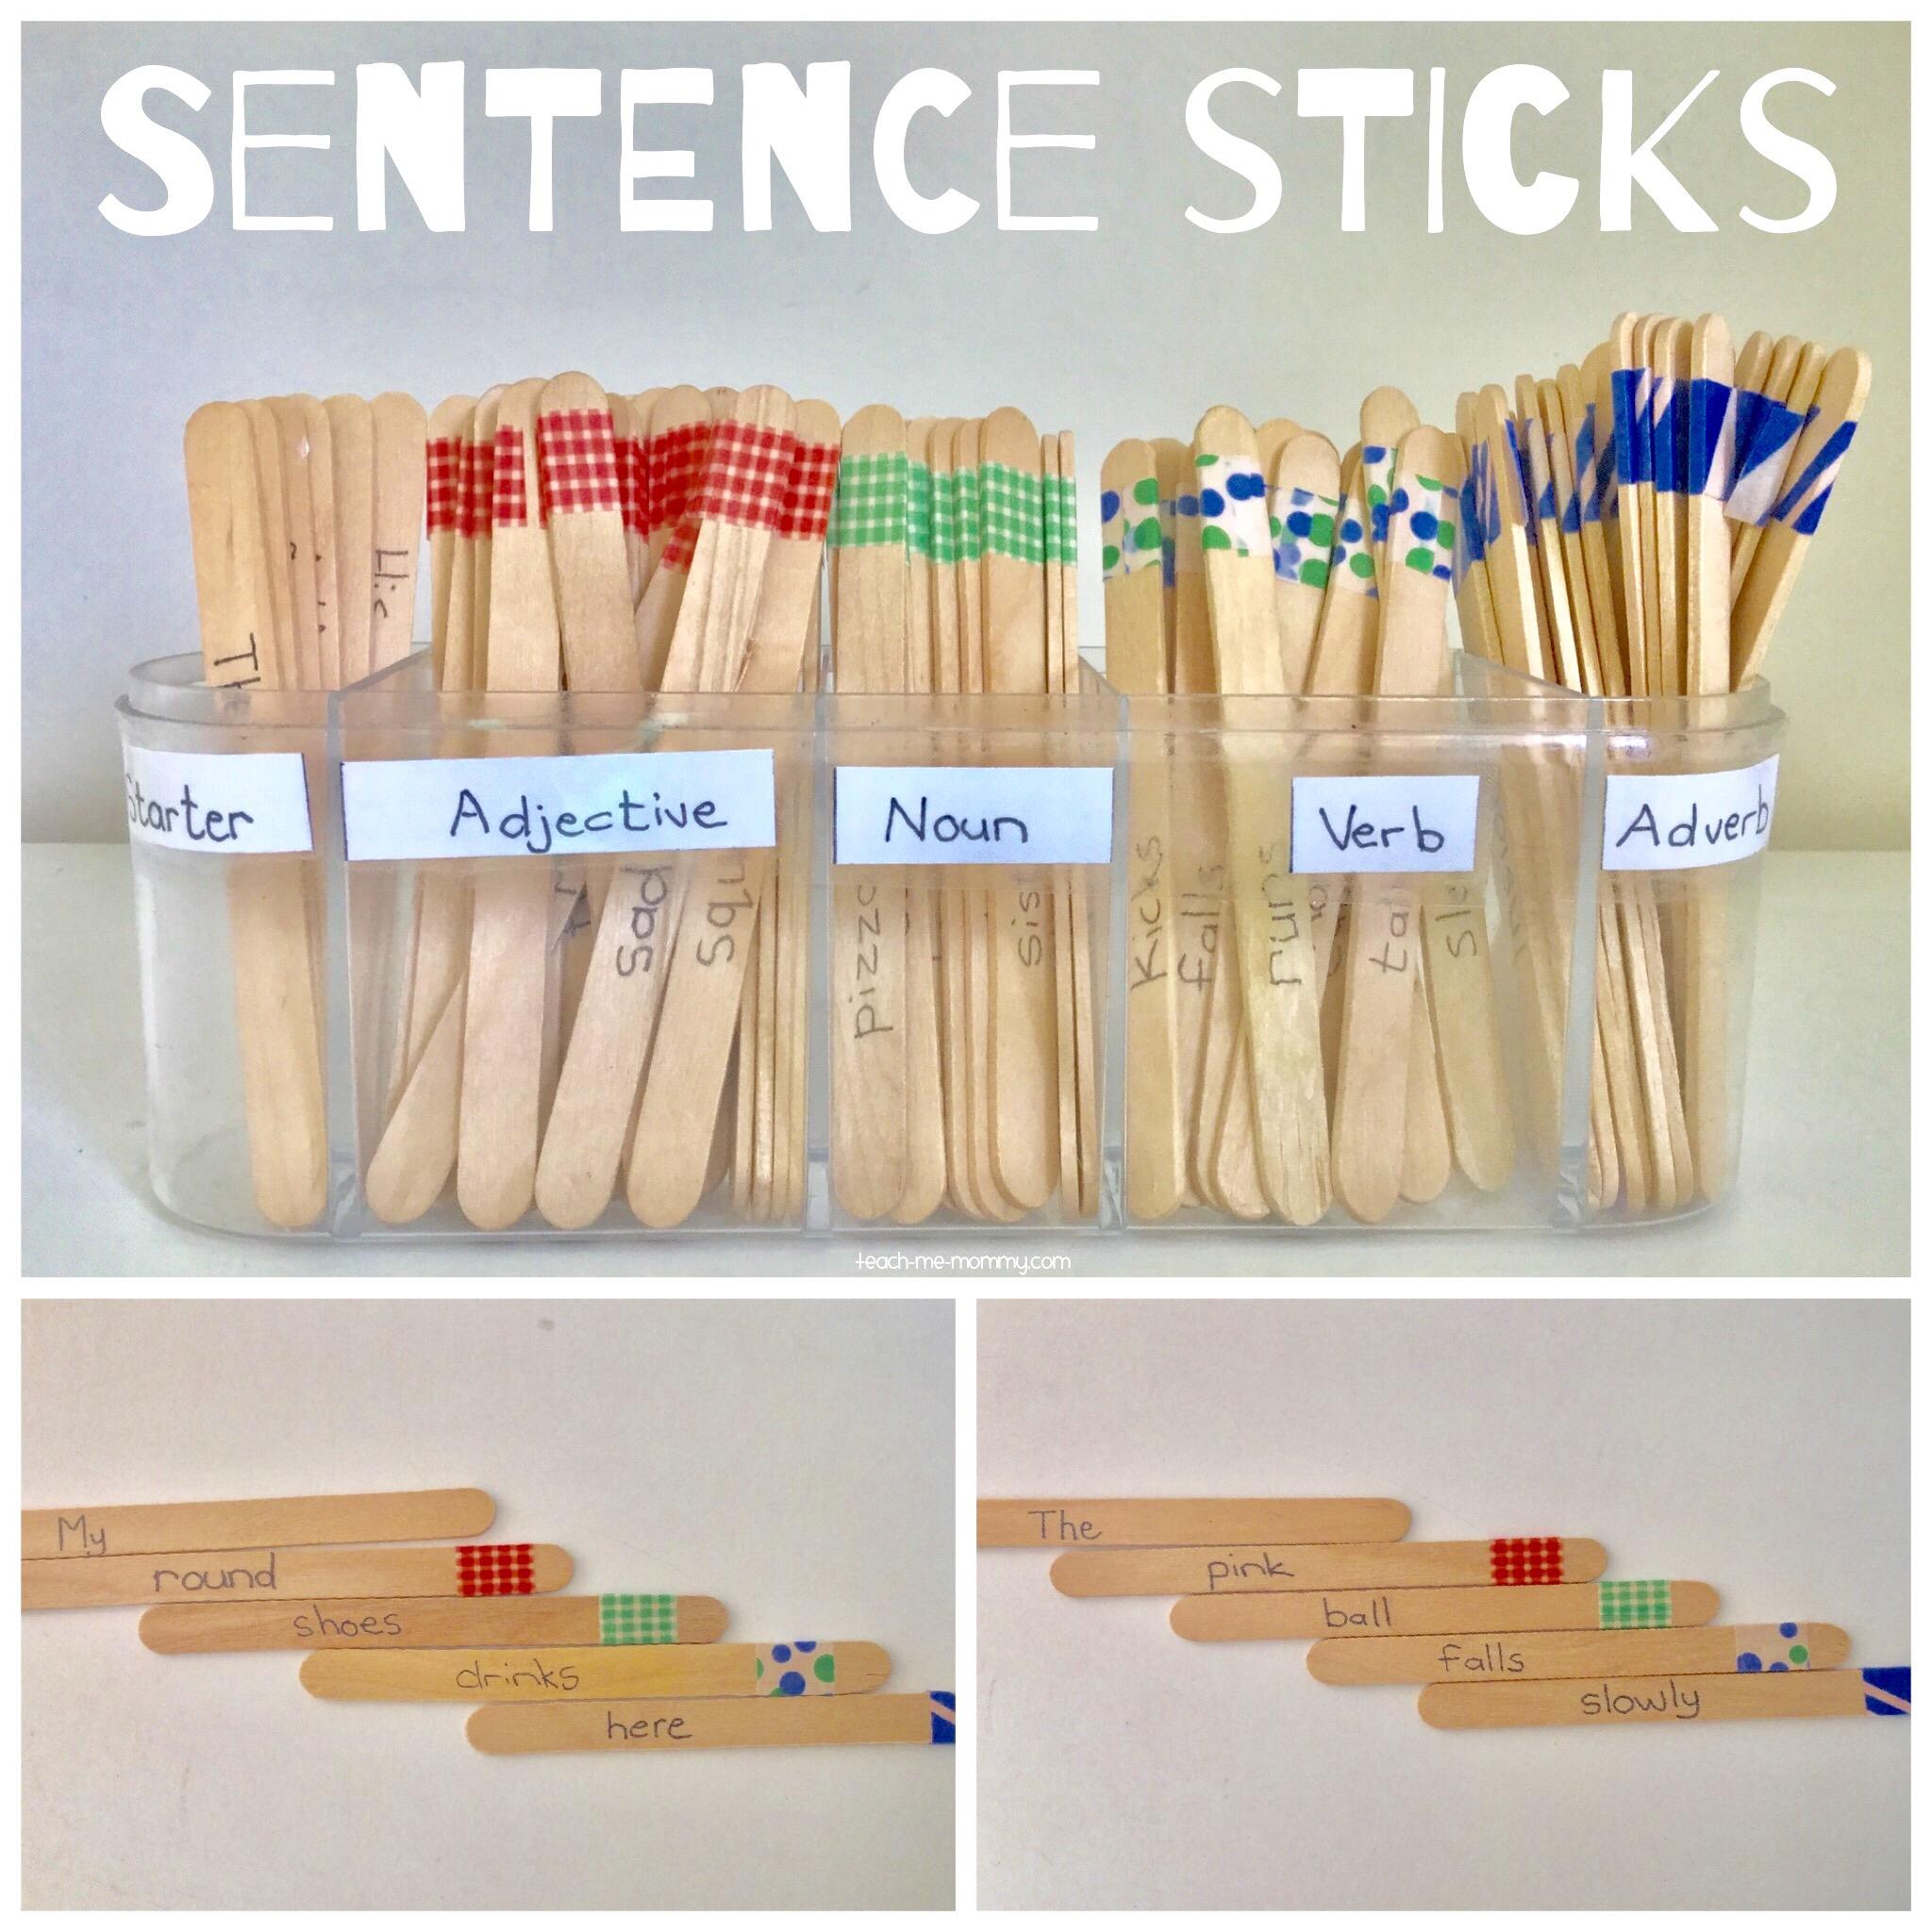 Sentence sticks